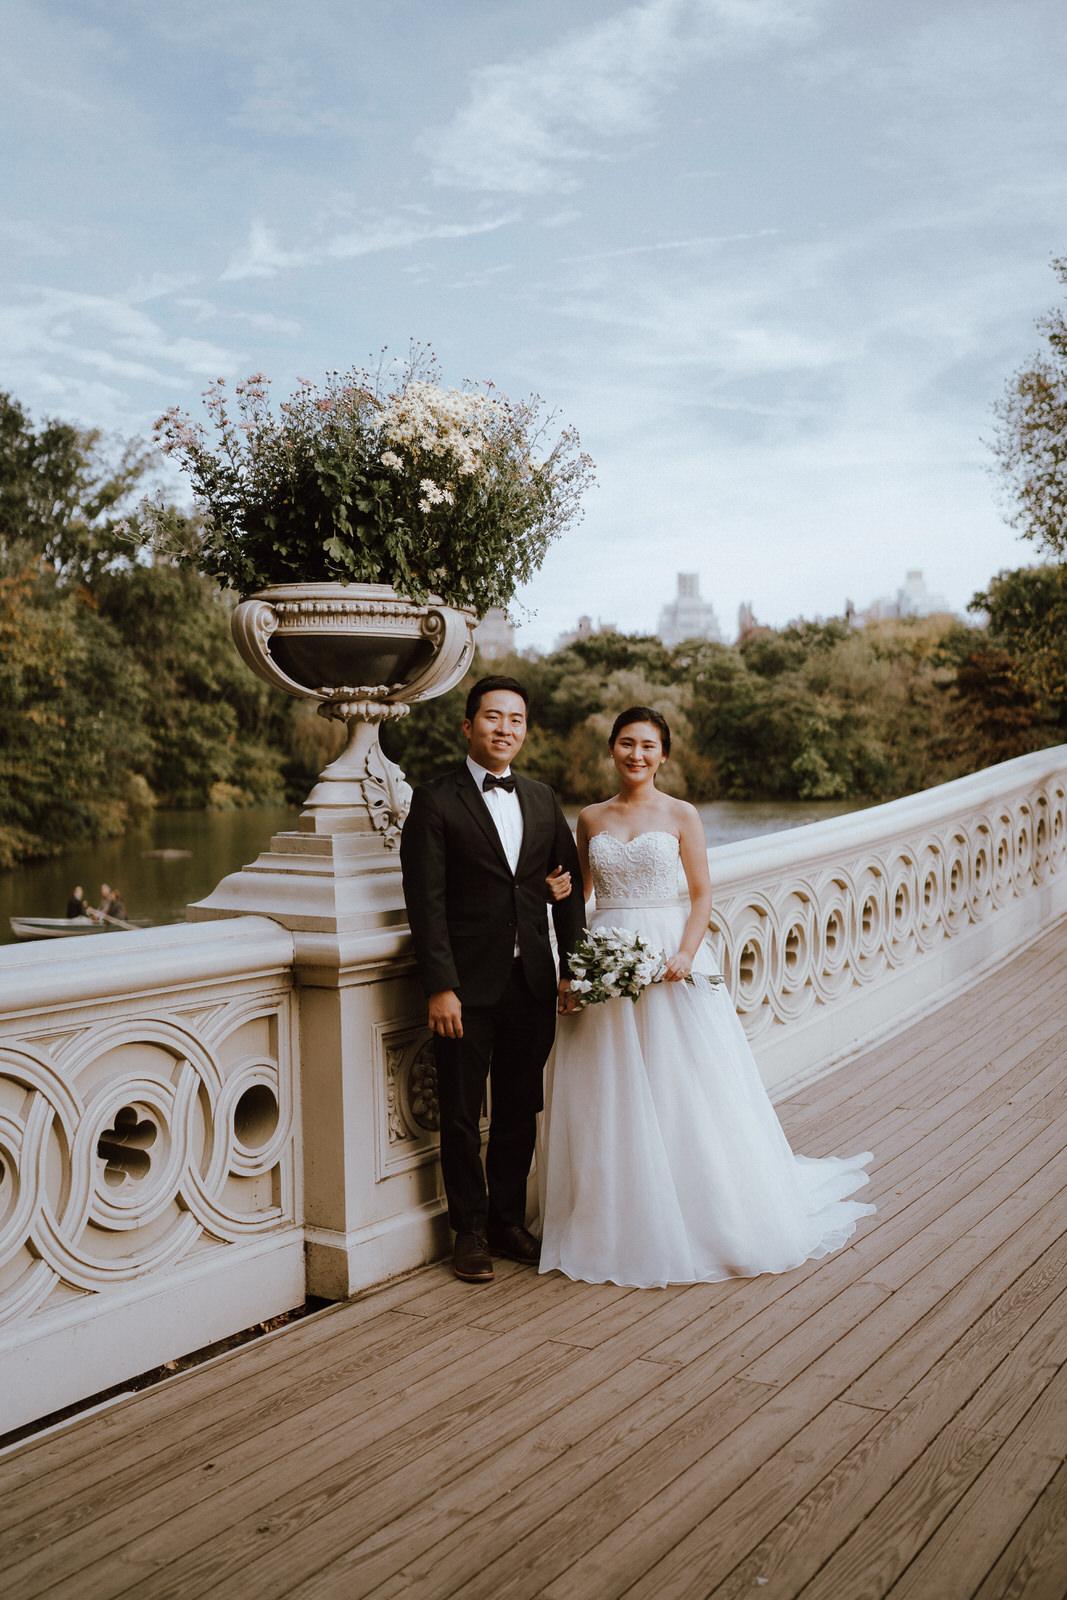 Central Park Elopement Photos-Bow Bridge-Michelle Gonzalez Photography- New York Wedding Photographer-1.jpg